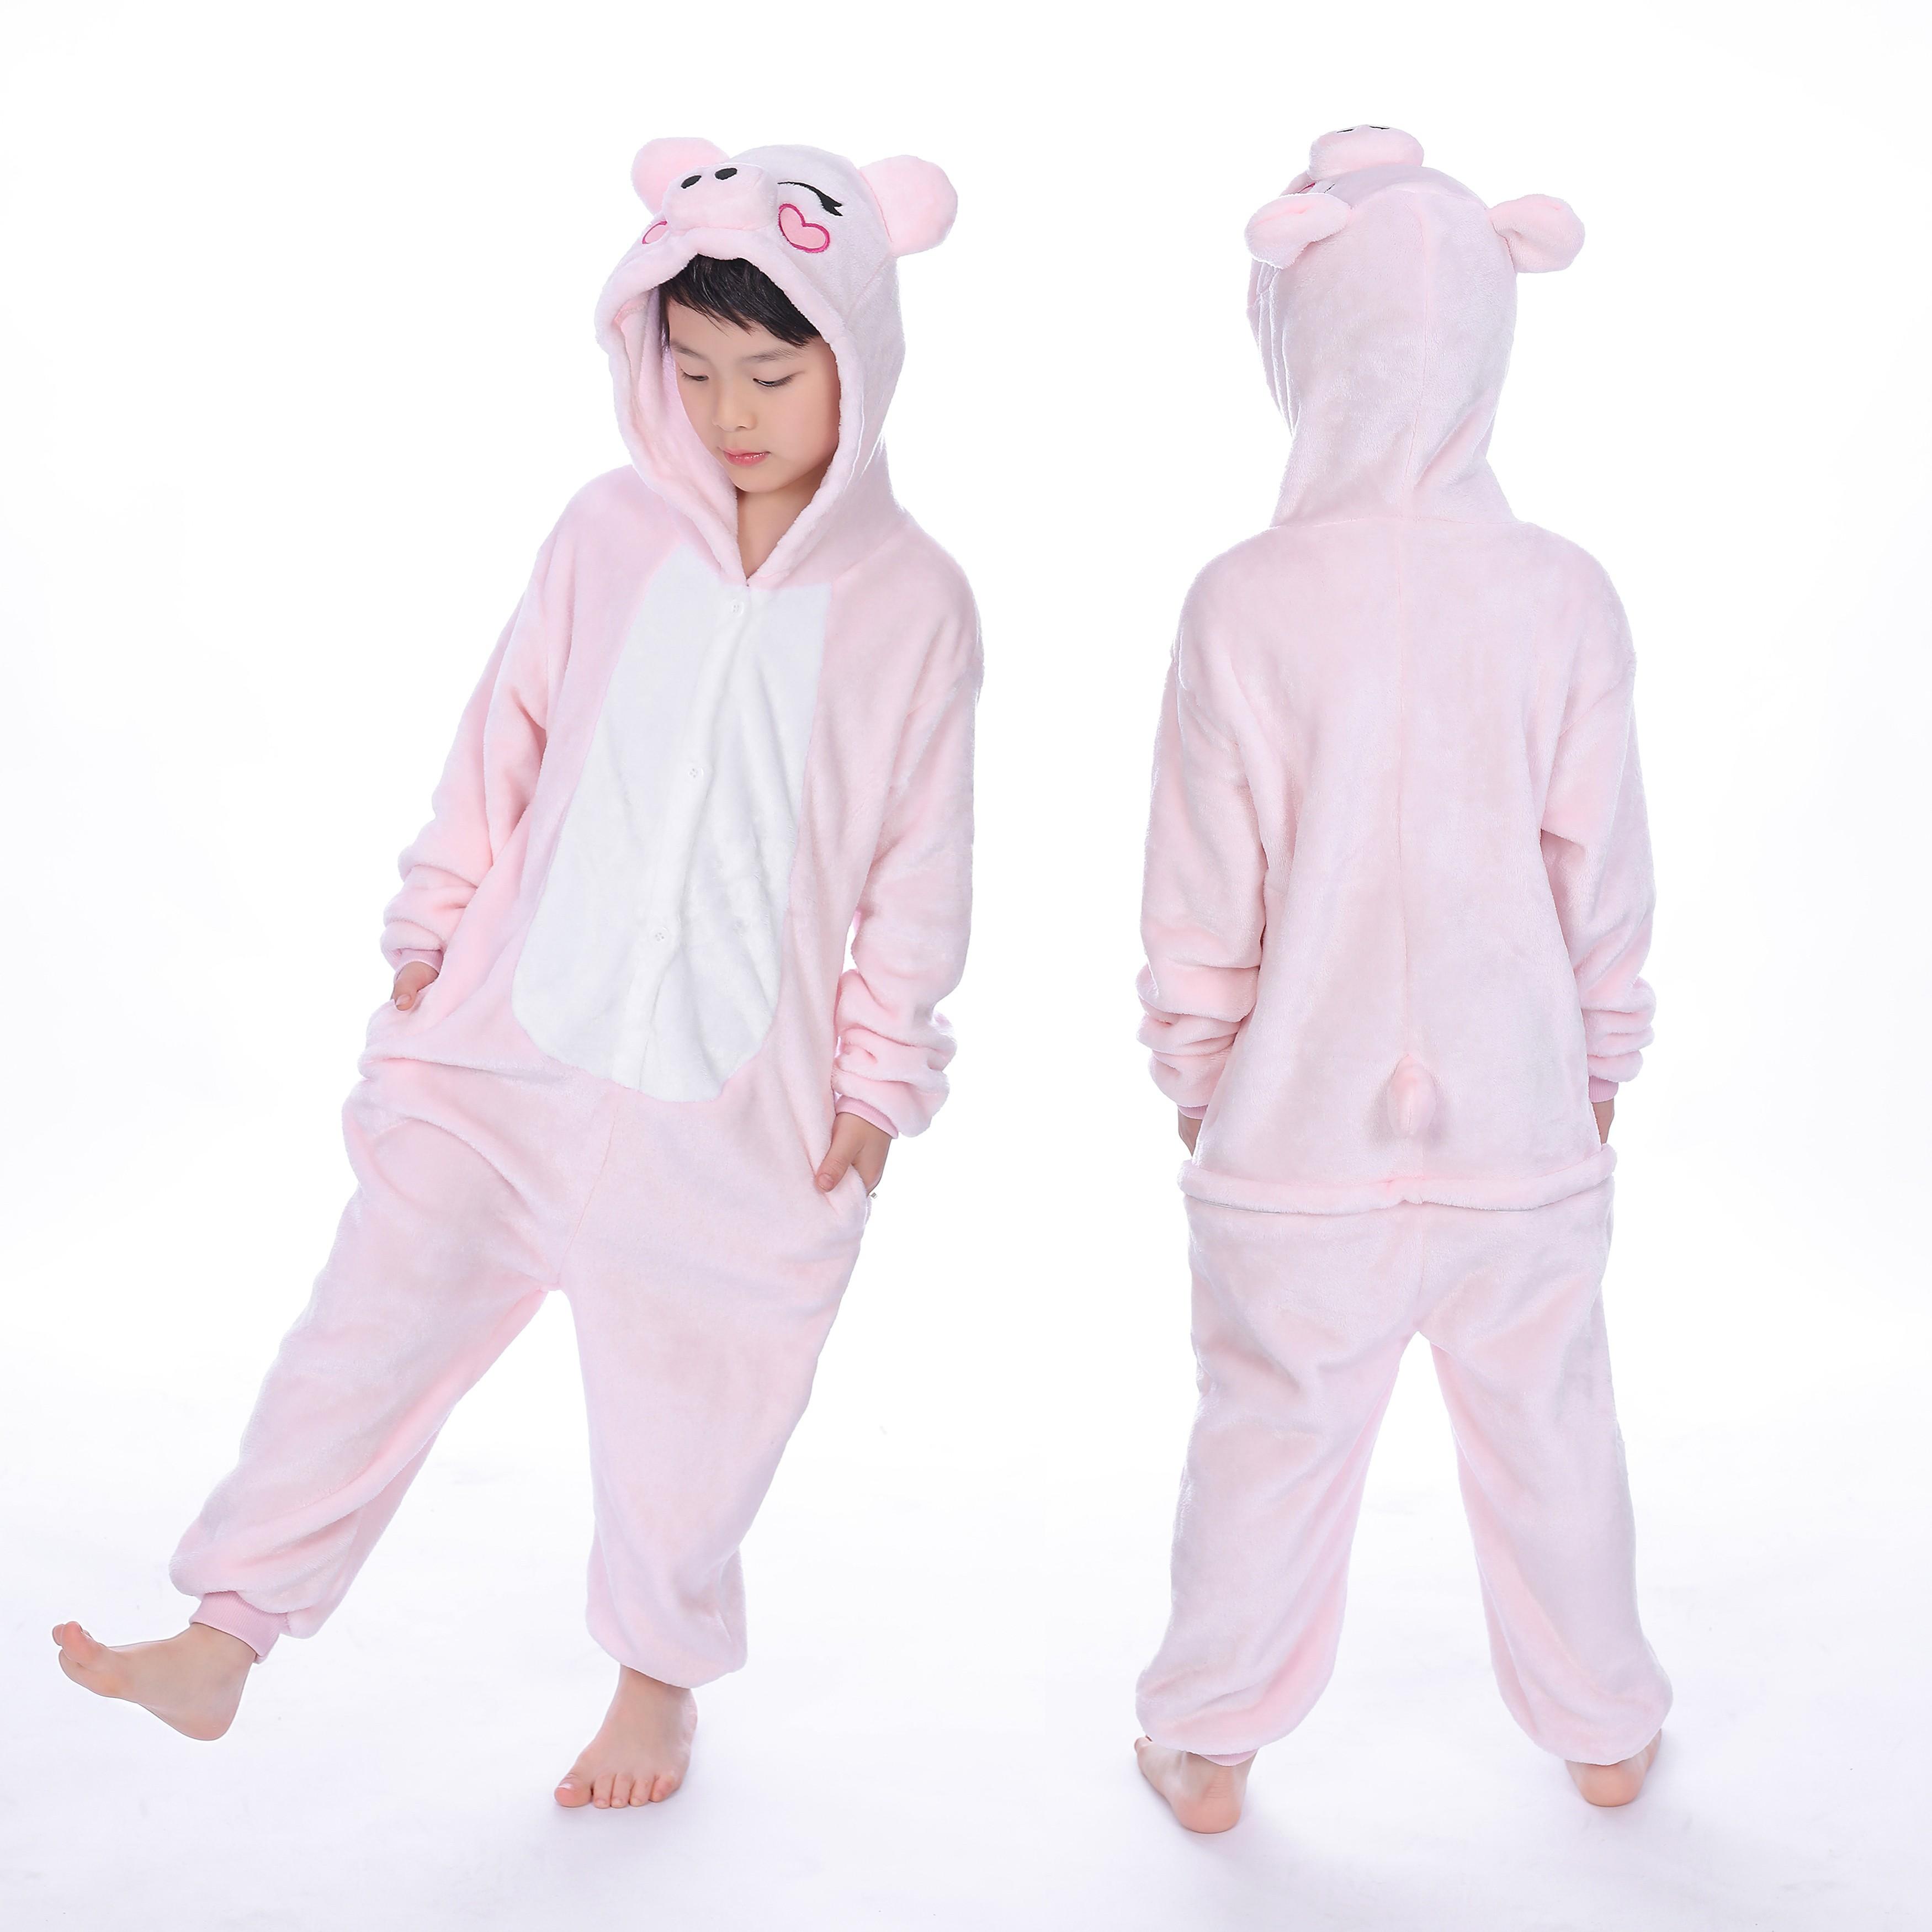 70bbee36c3ba Pink Pig Onesie for Kid Animal Kigurumi Pajama Halloween Costumes